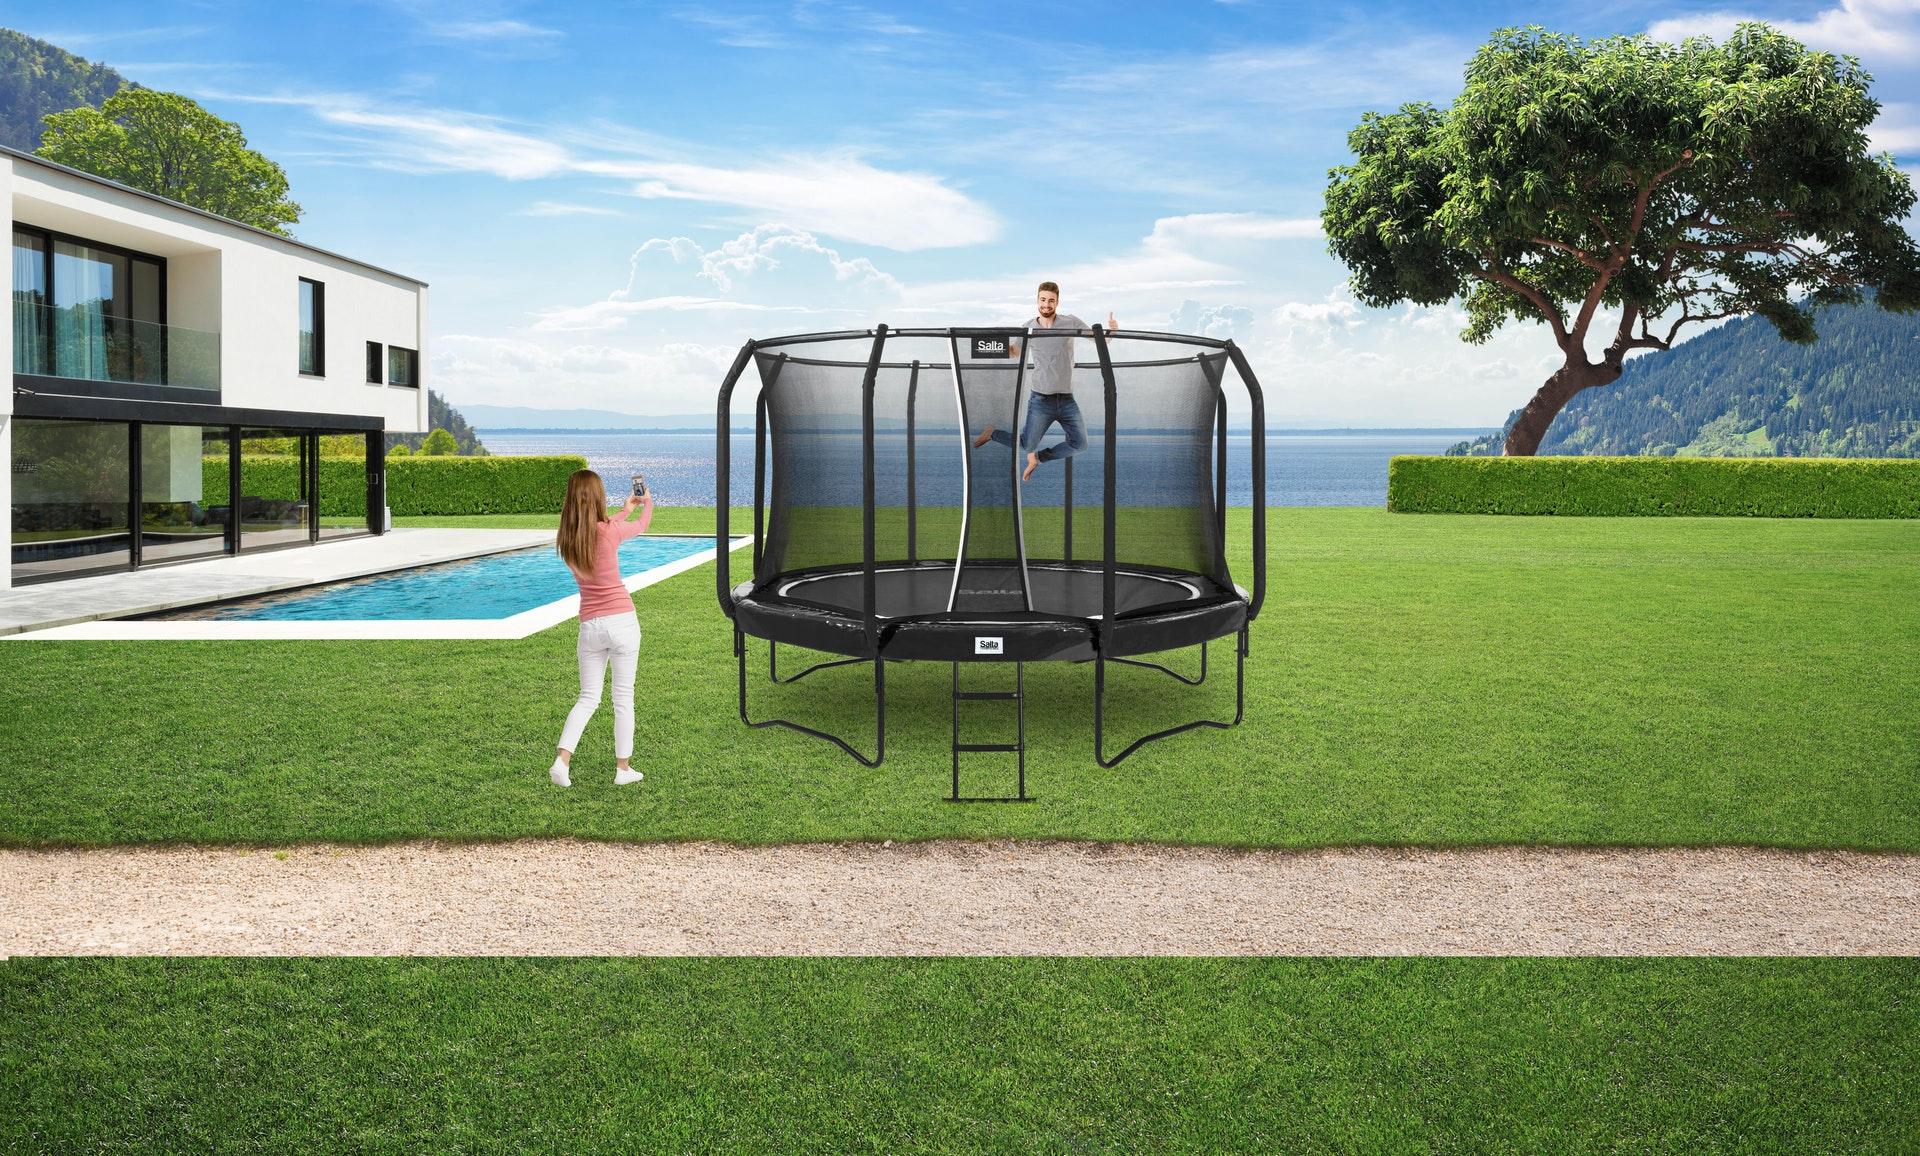 SALTA First Class - Kaufen und Beratung - trampolin-profi.de - 09188-9999001